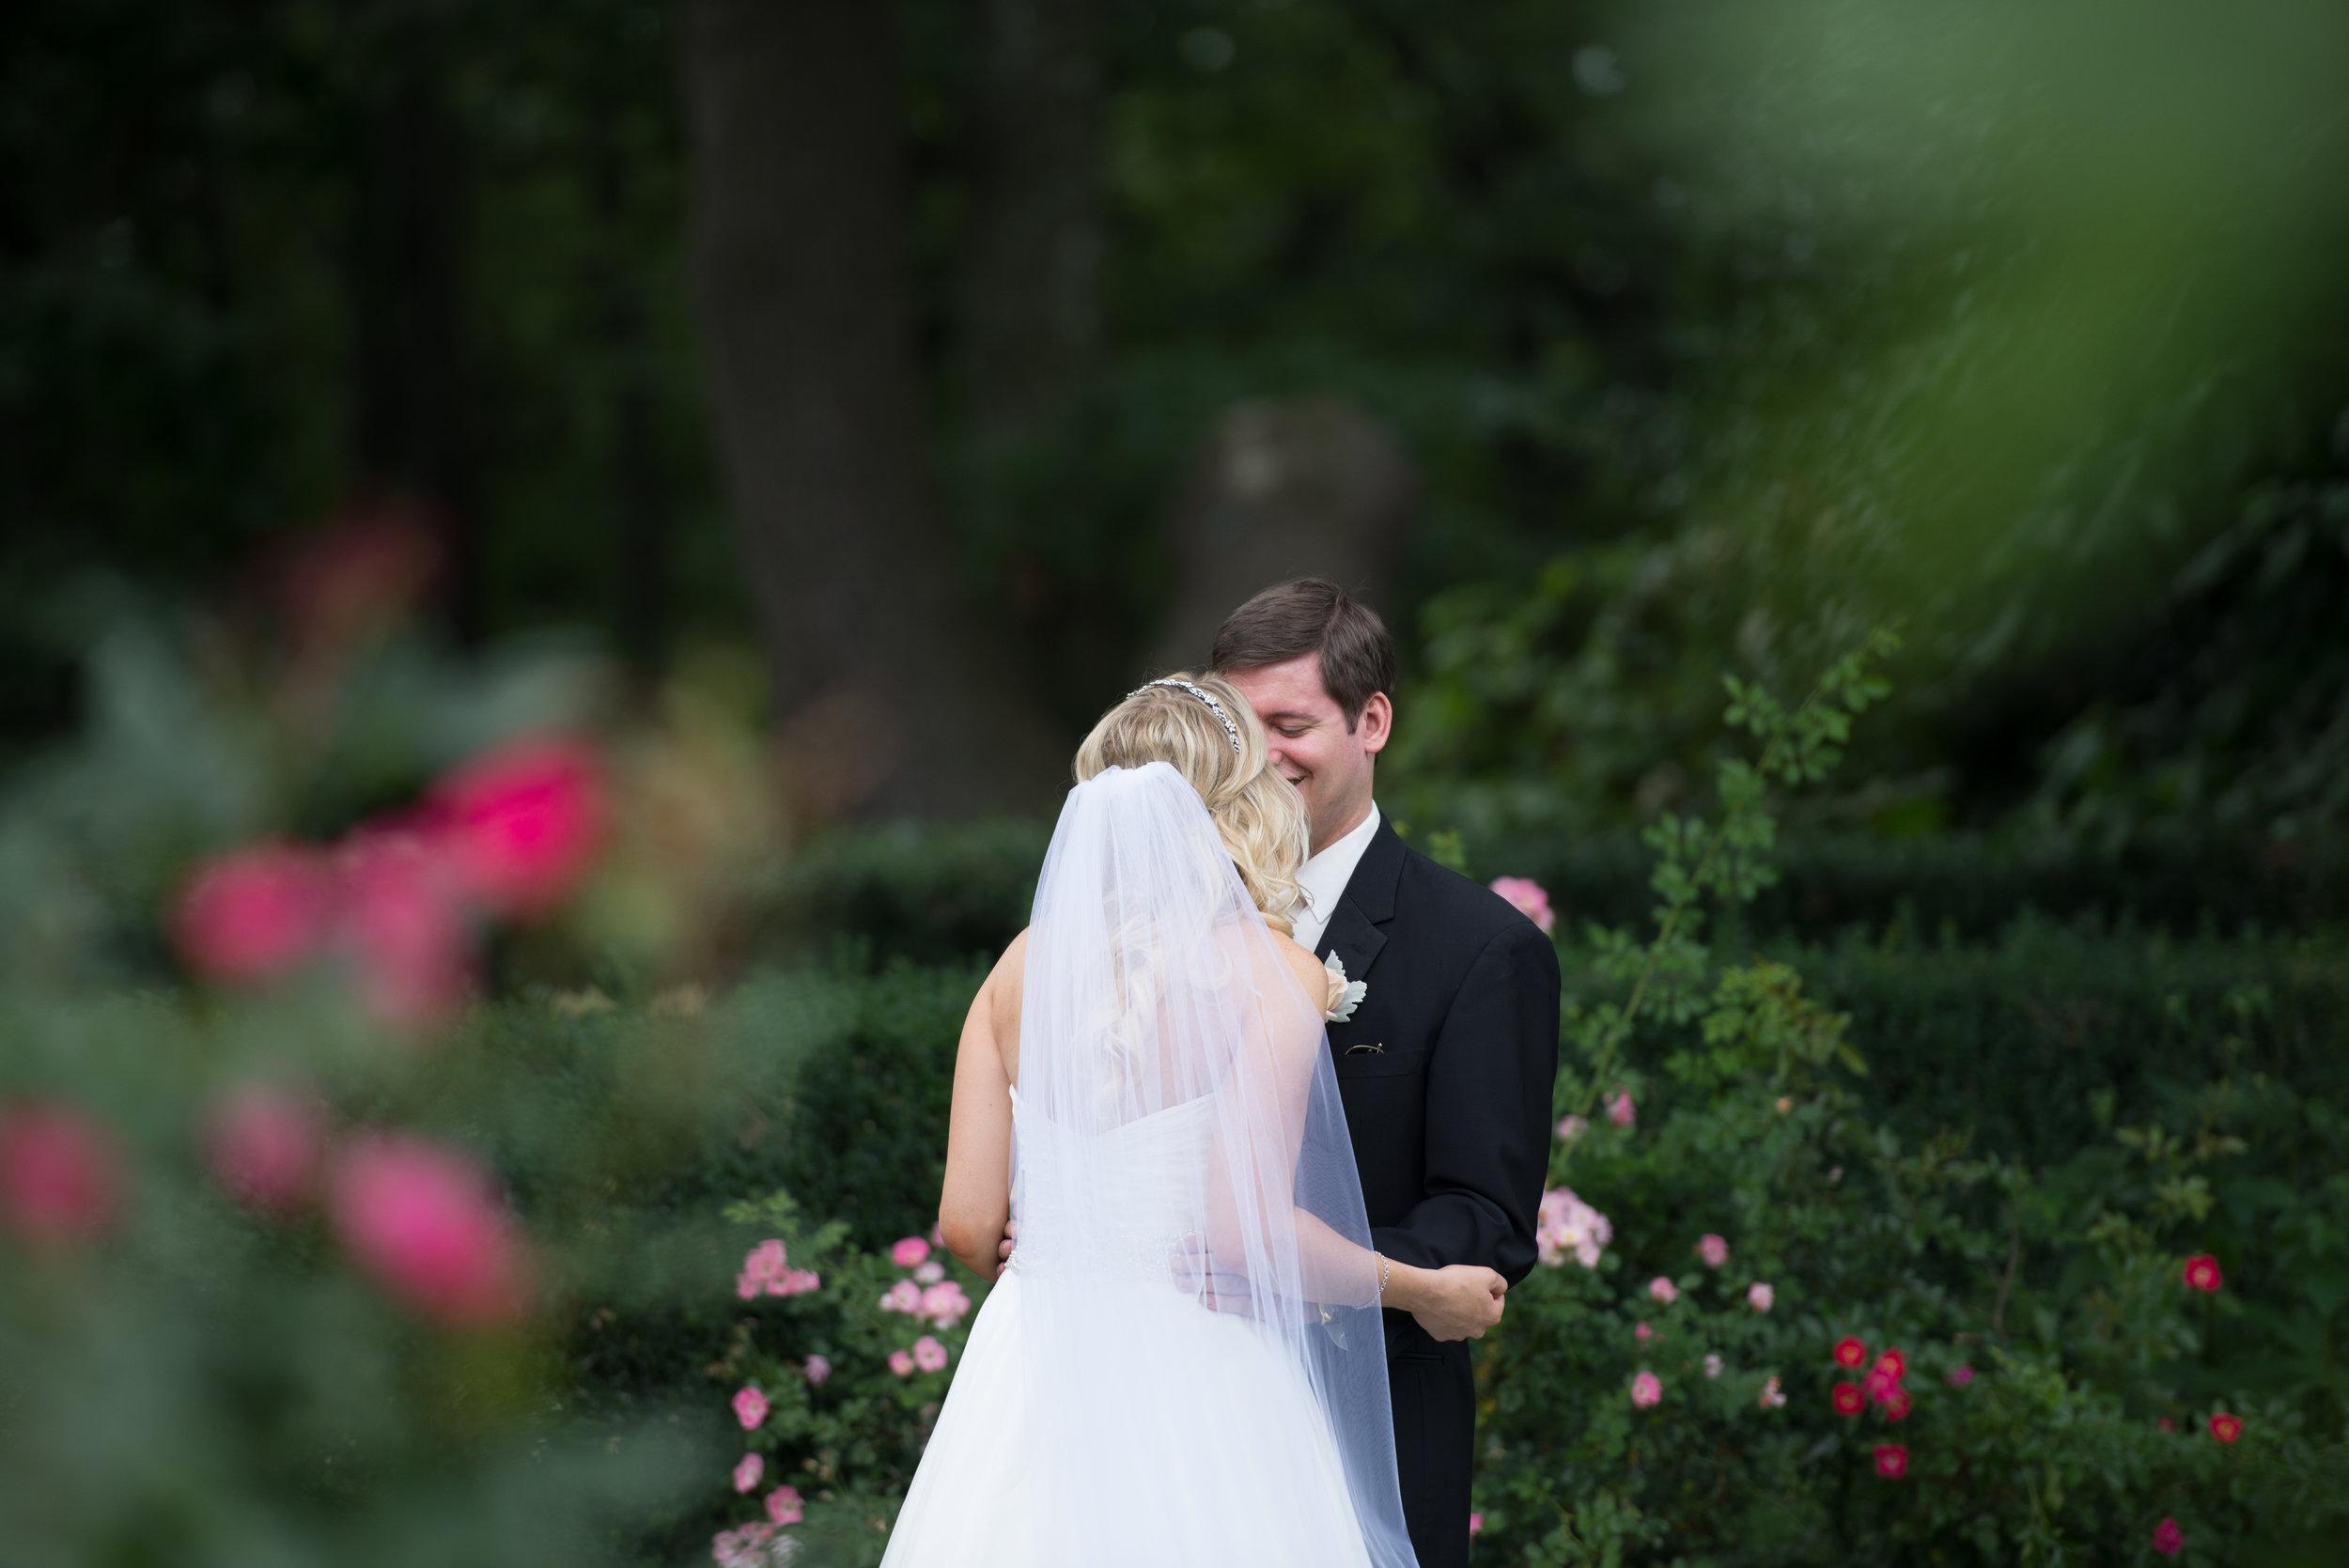 Wedding First Look Photos00942.jpg